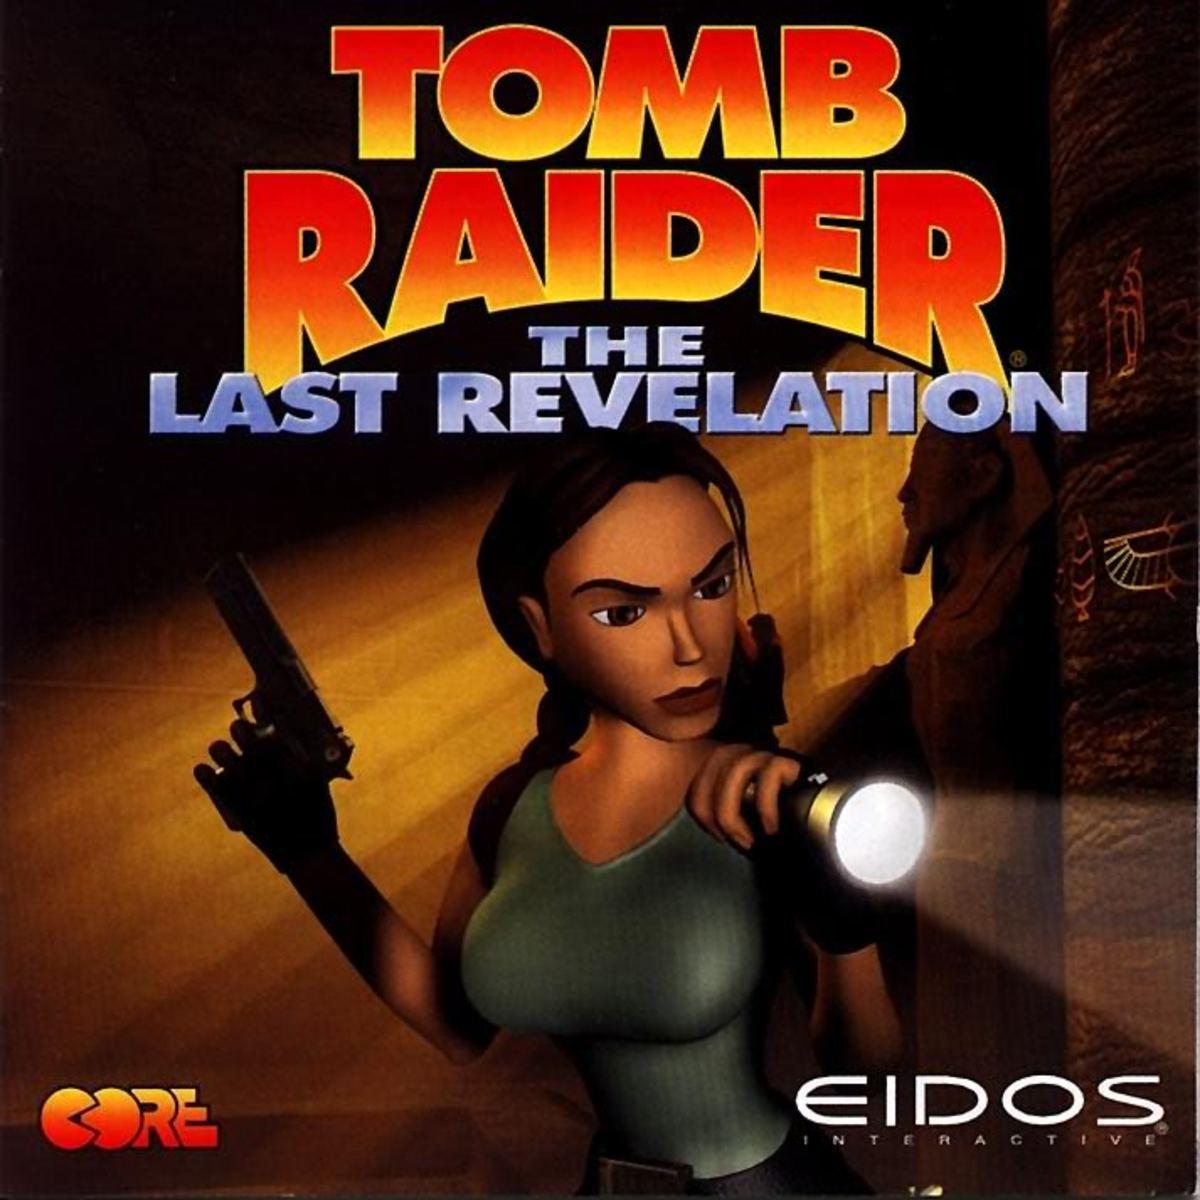 Tomb Raider 4 - The last revelation (1999)